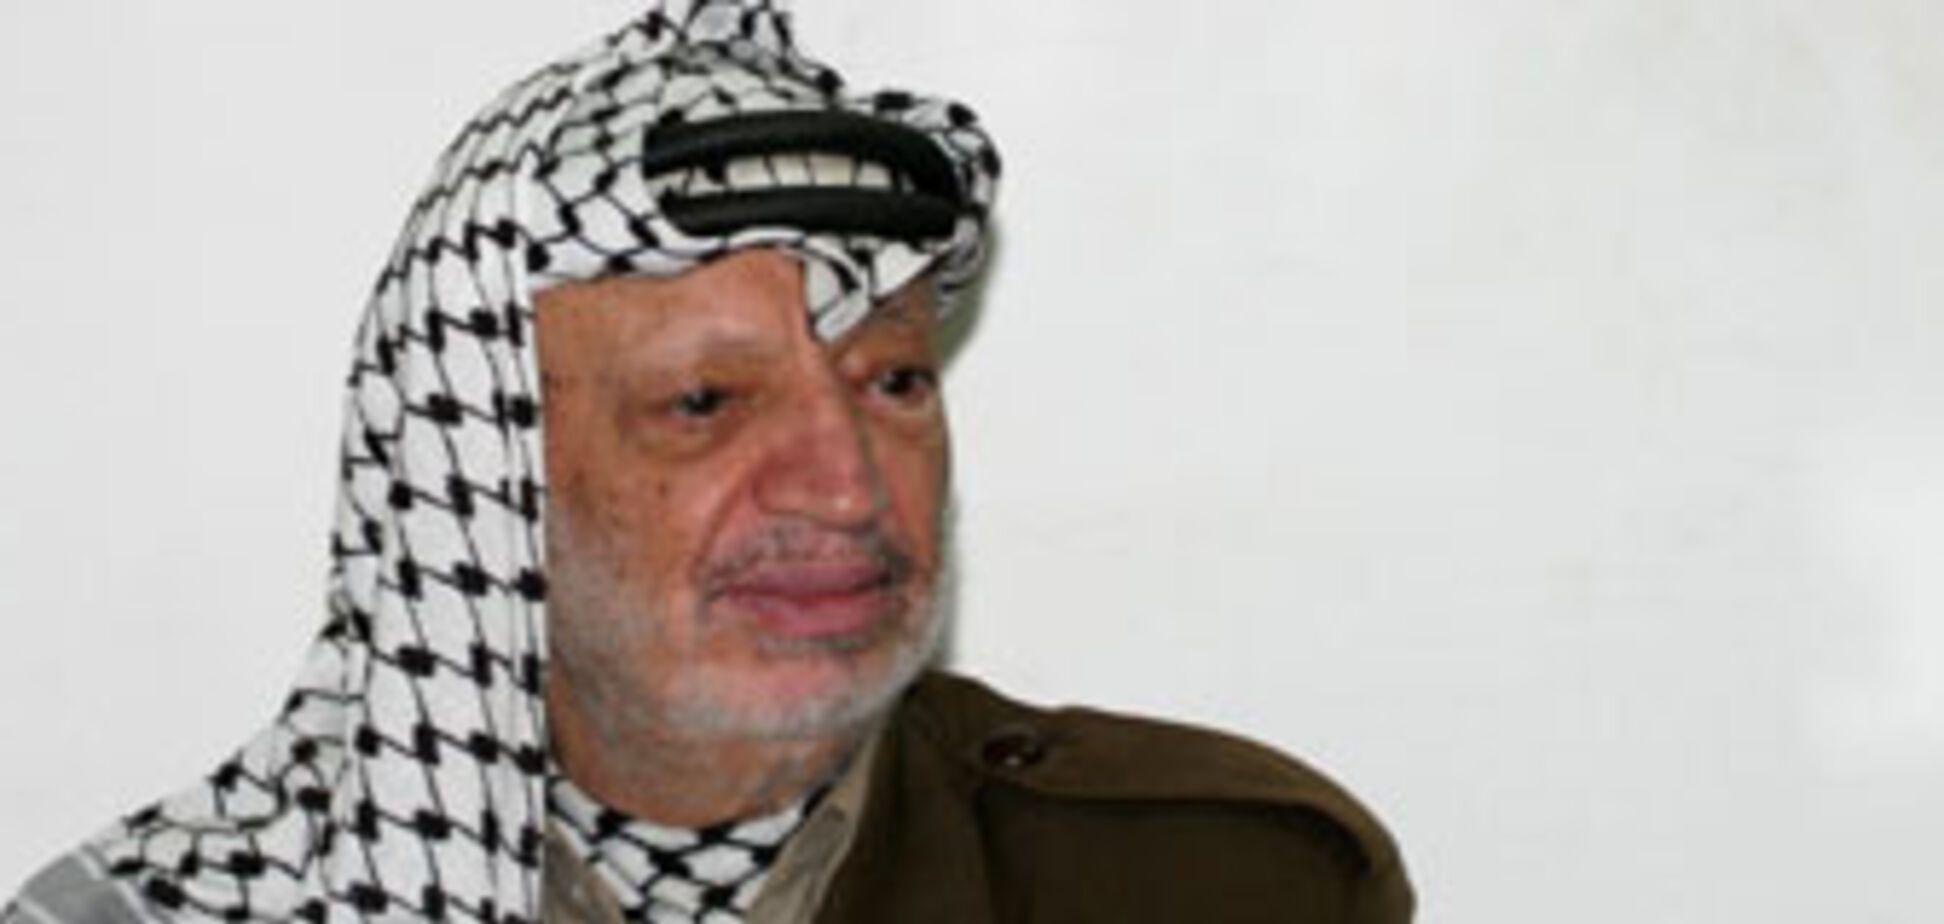 Ясир Арафат працював на Саддама Хусейна